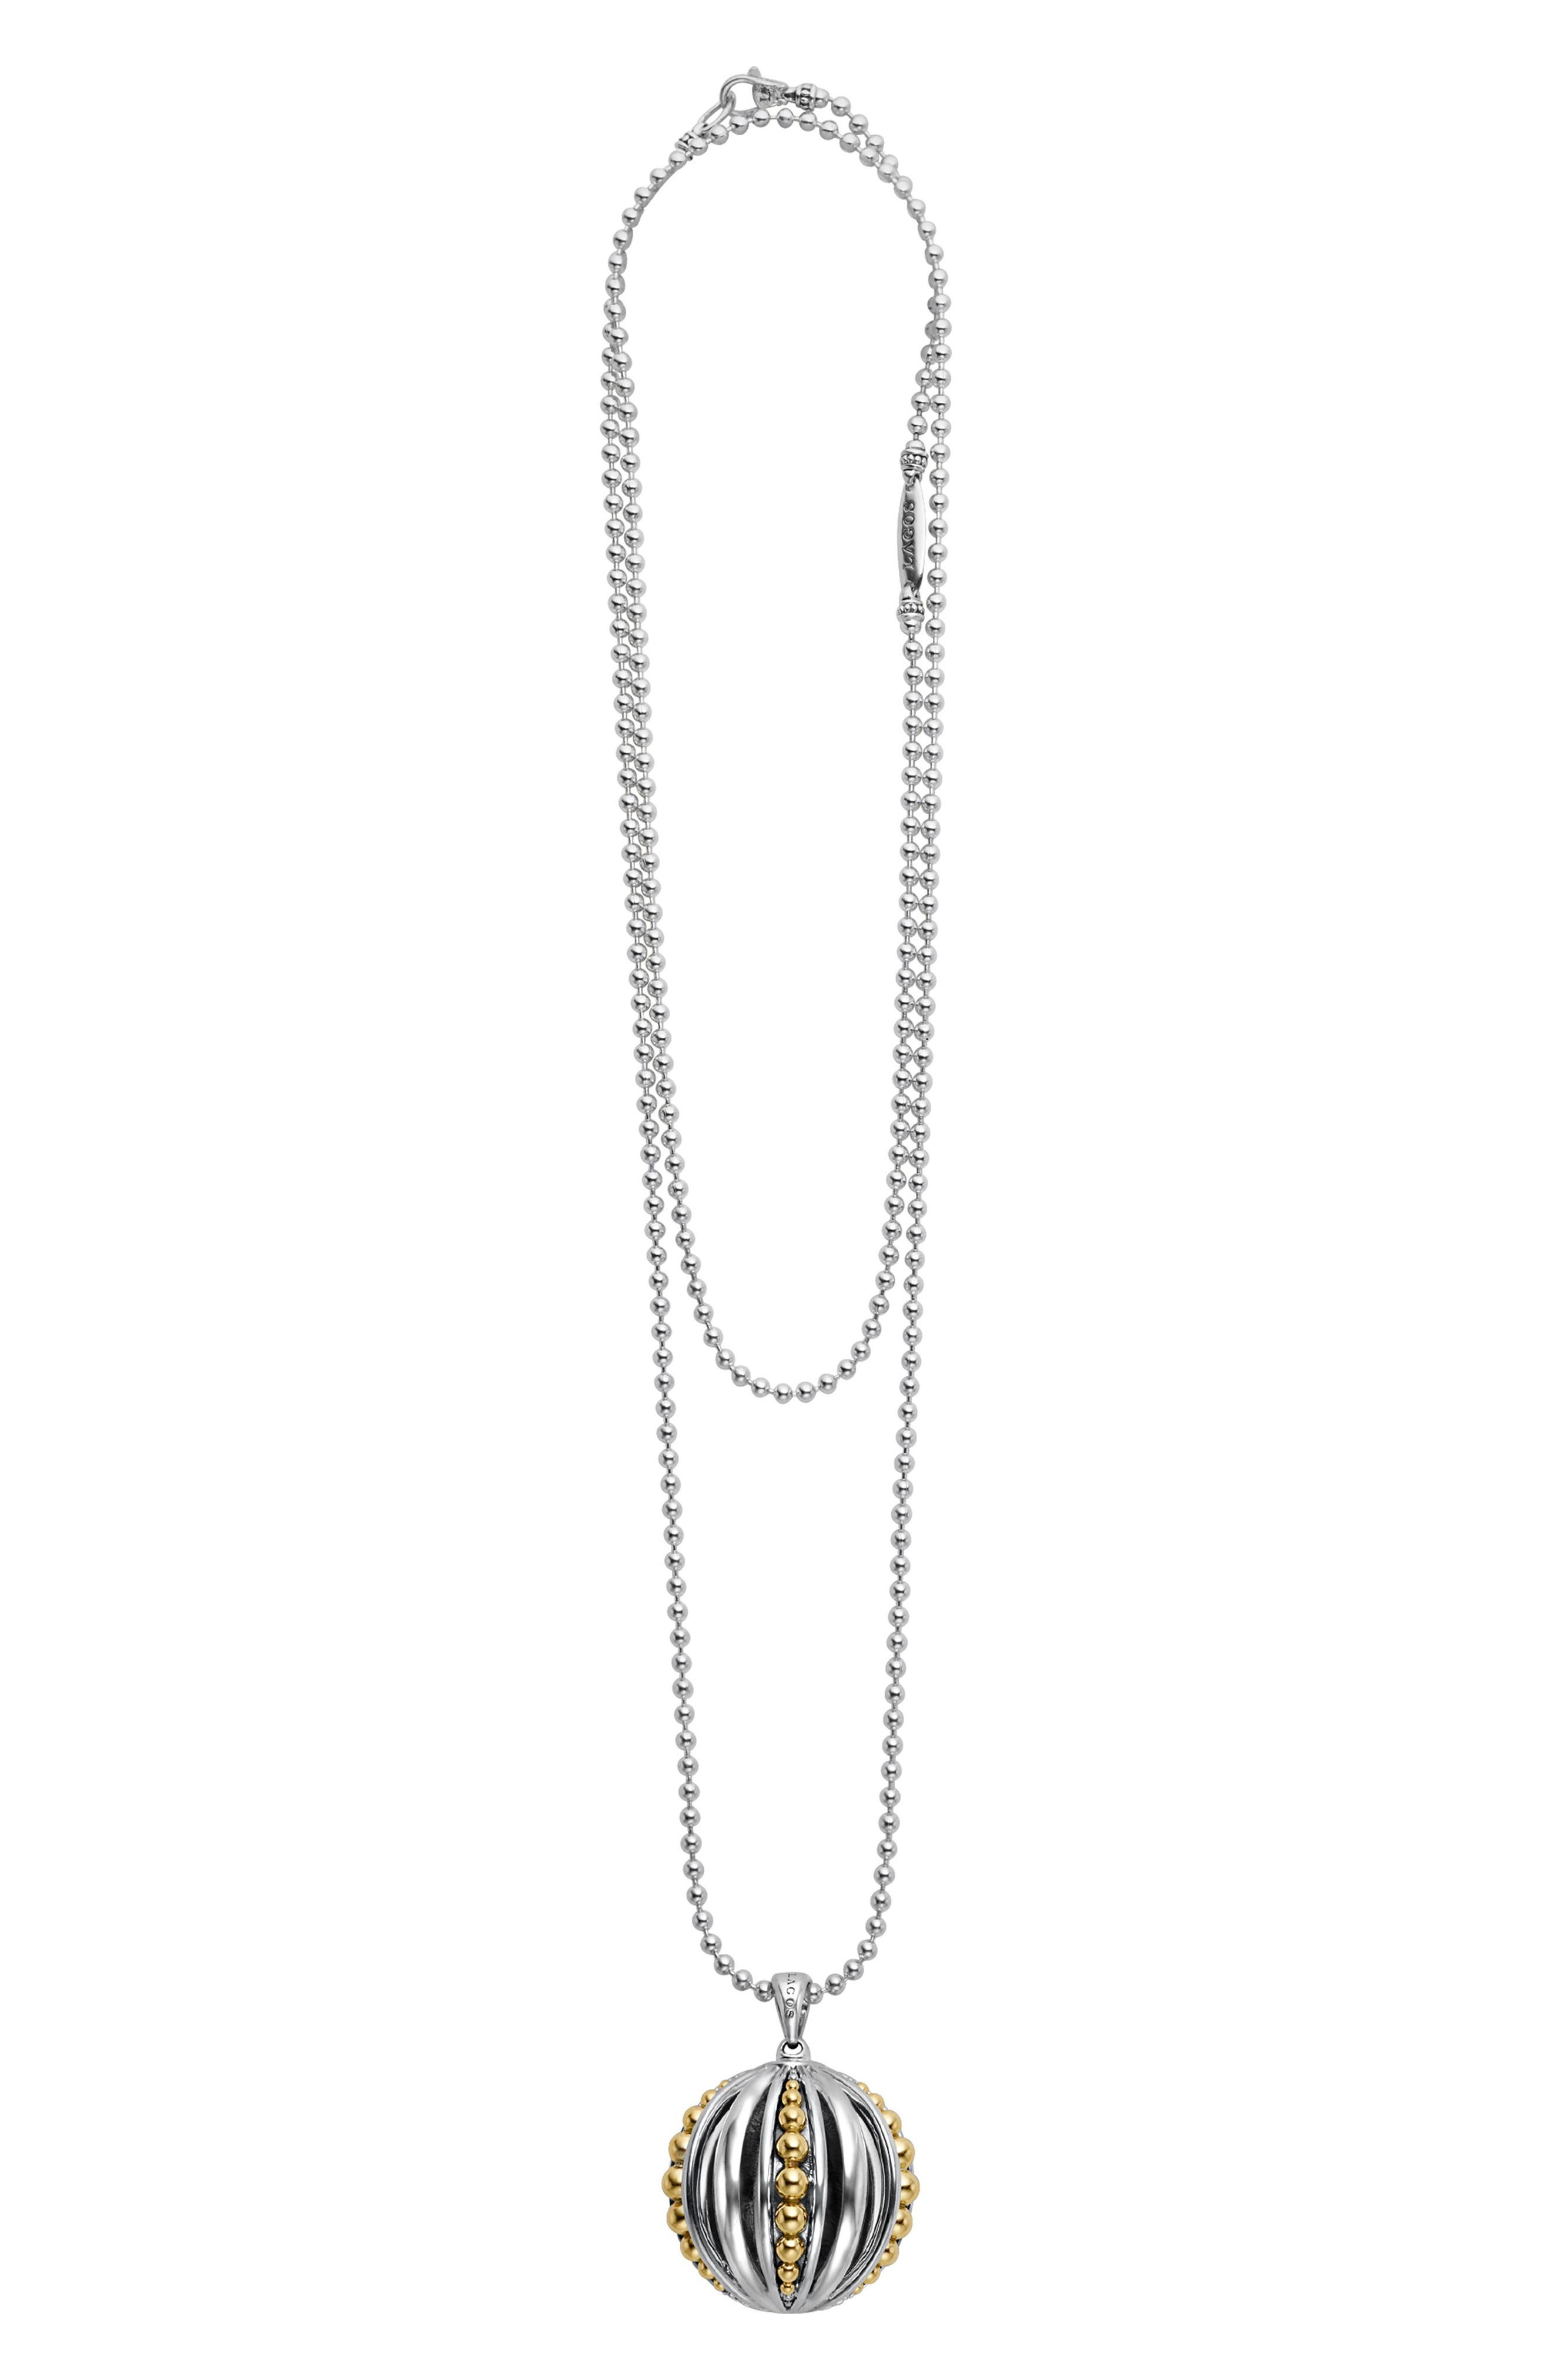 LAGOS Caviar Talisman Beaded Cage Ball Pendant Necklace